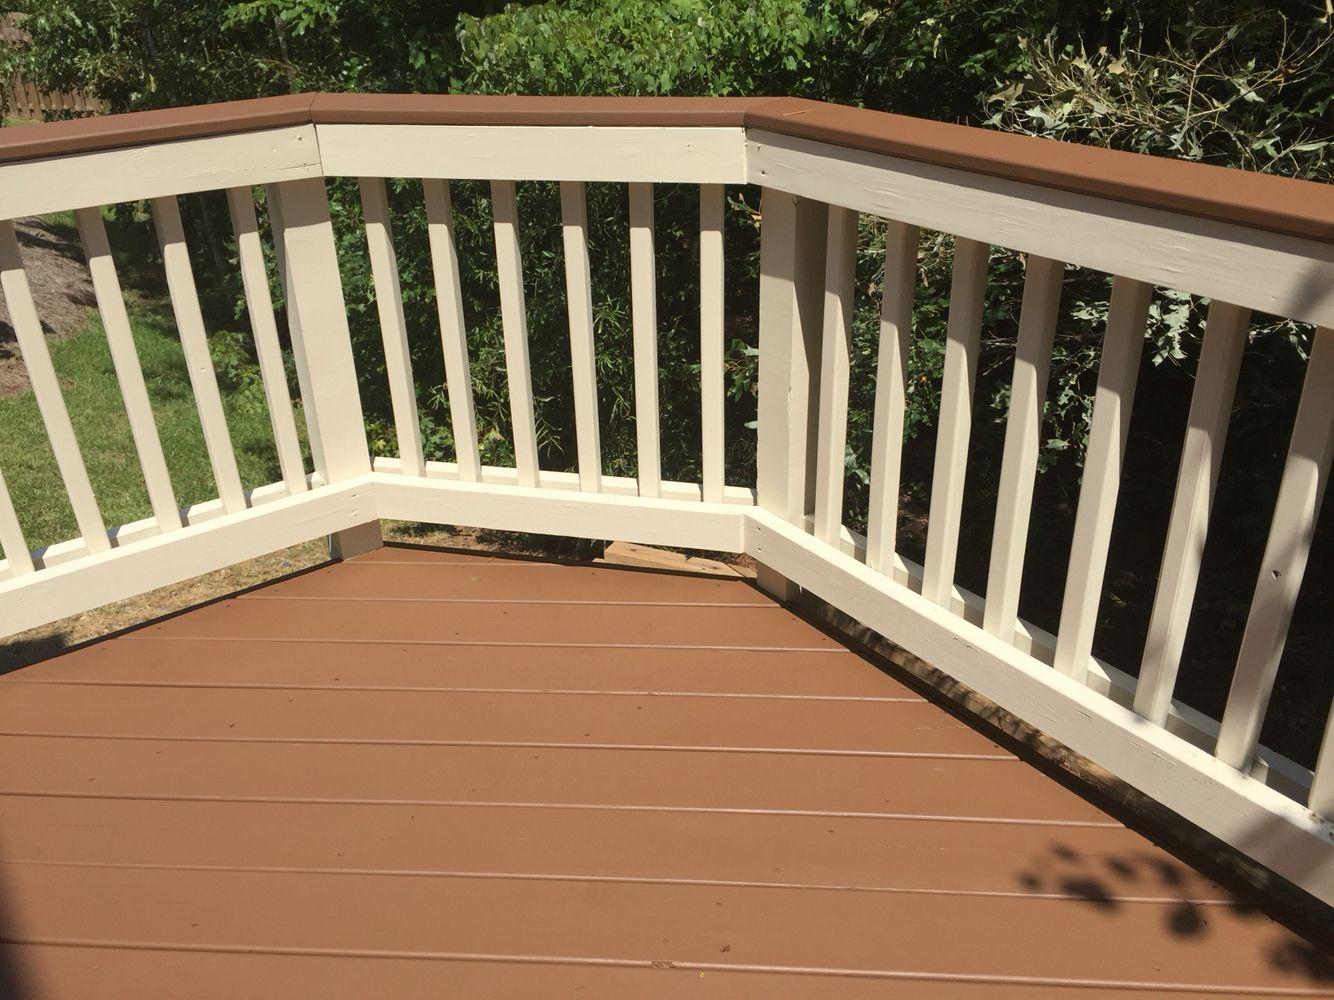 Sherwin Williams Deckscapes Stain In Pine Cone Deck Colors Staining Deck Deck Stain Colors